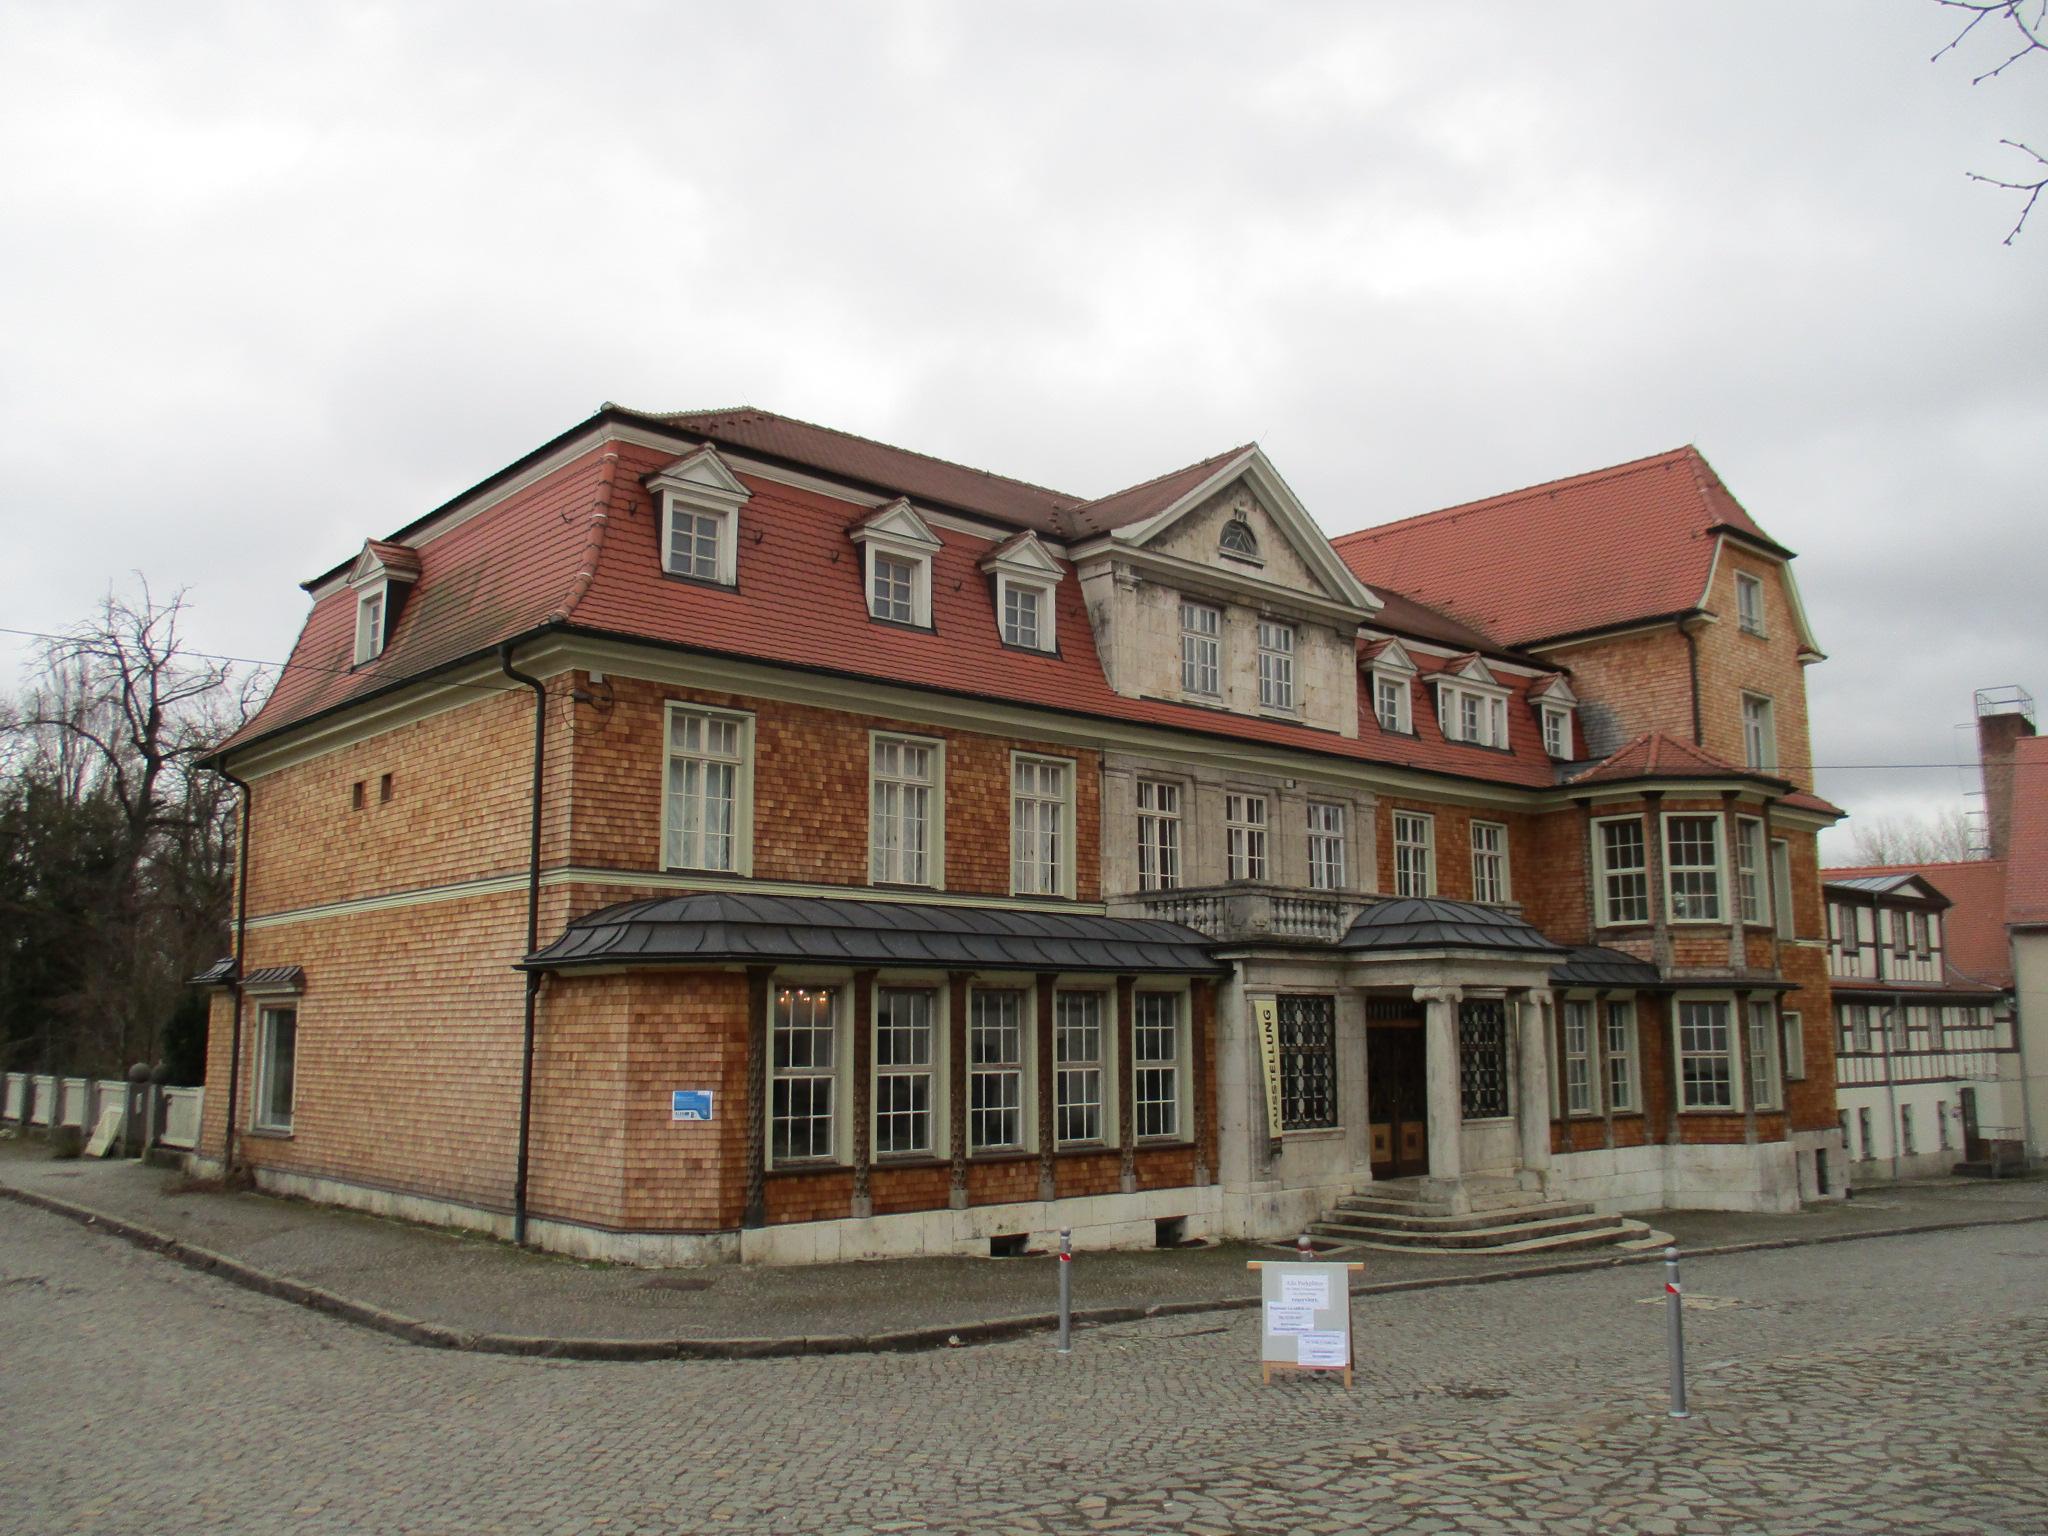 Instandsetzung der Holzschindelfassade (RAG Weimarer Land - Mittelthüringen e.V.)